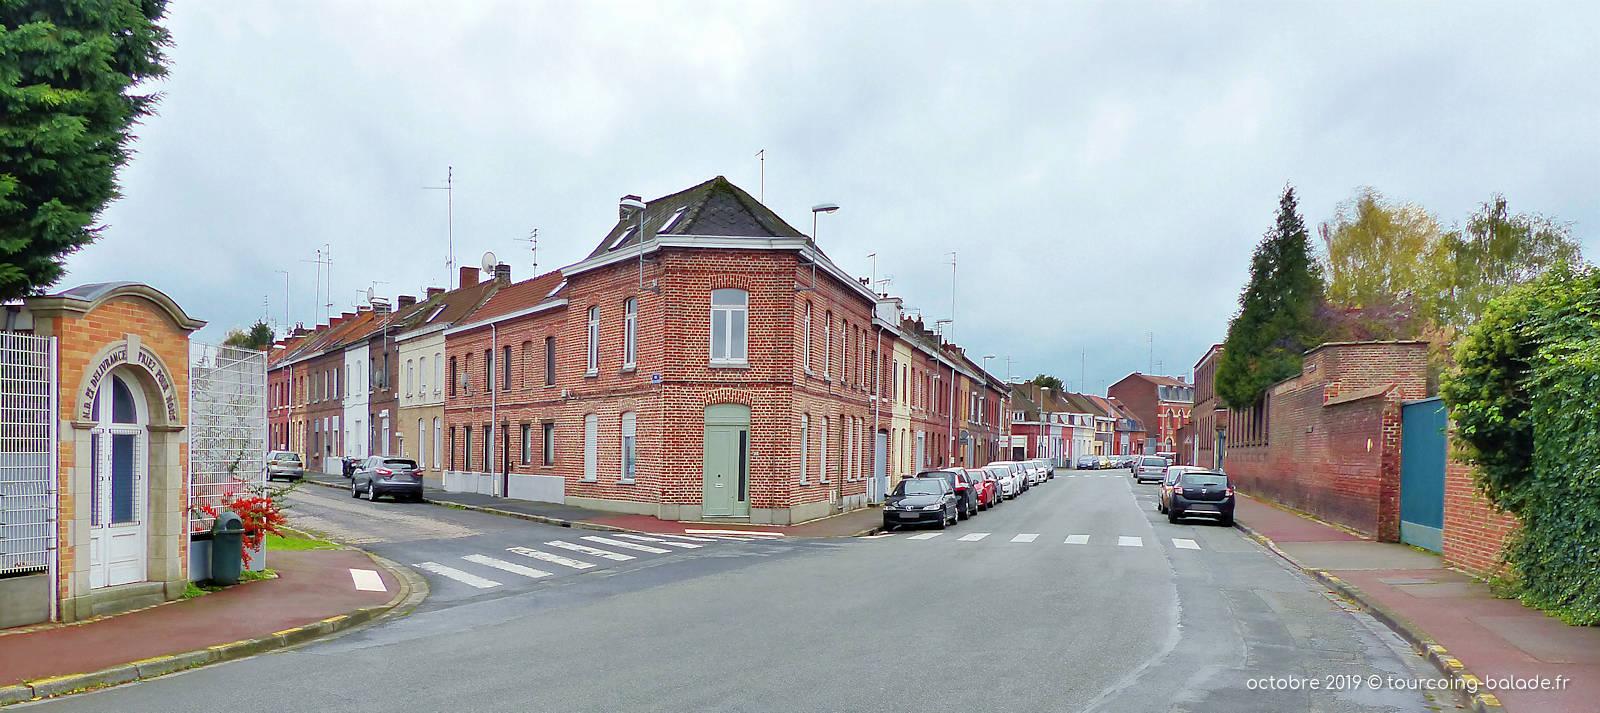 Rue du Virolois, Tourcoing - Oratoire.